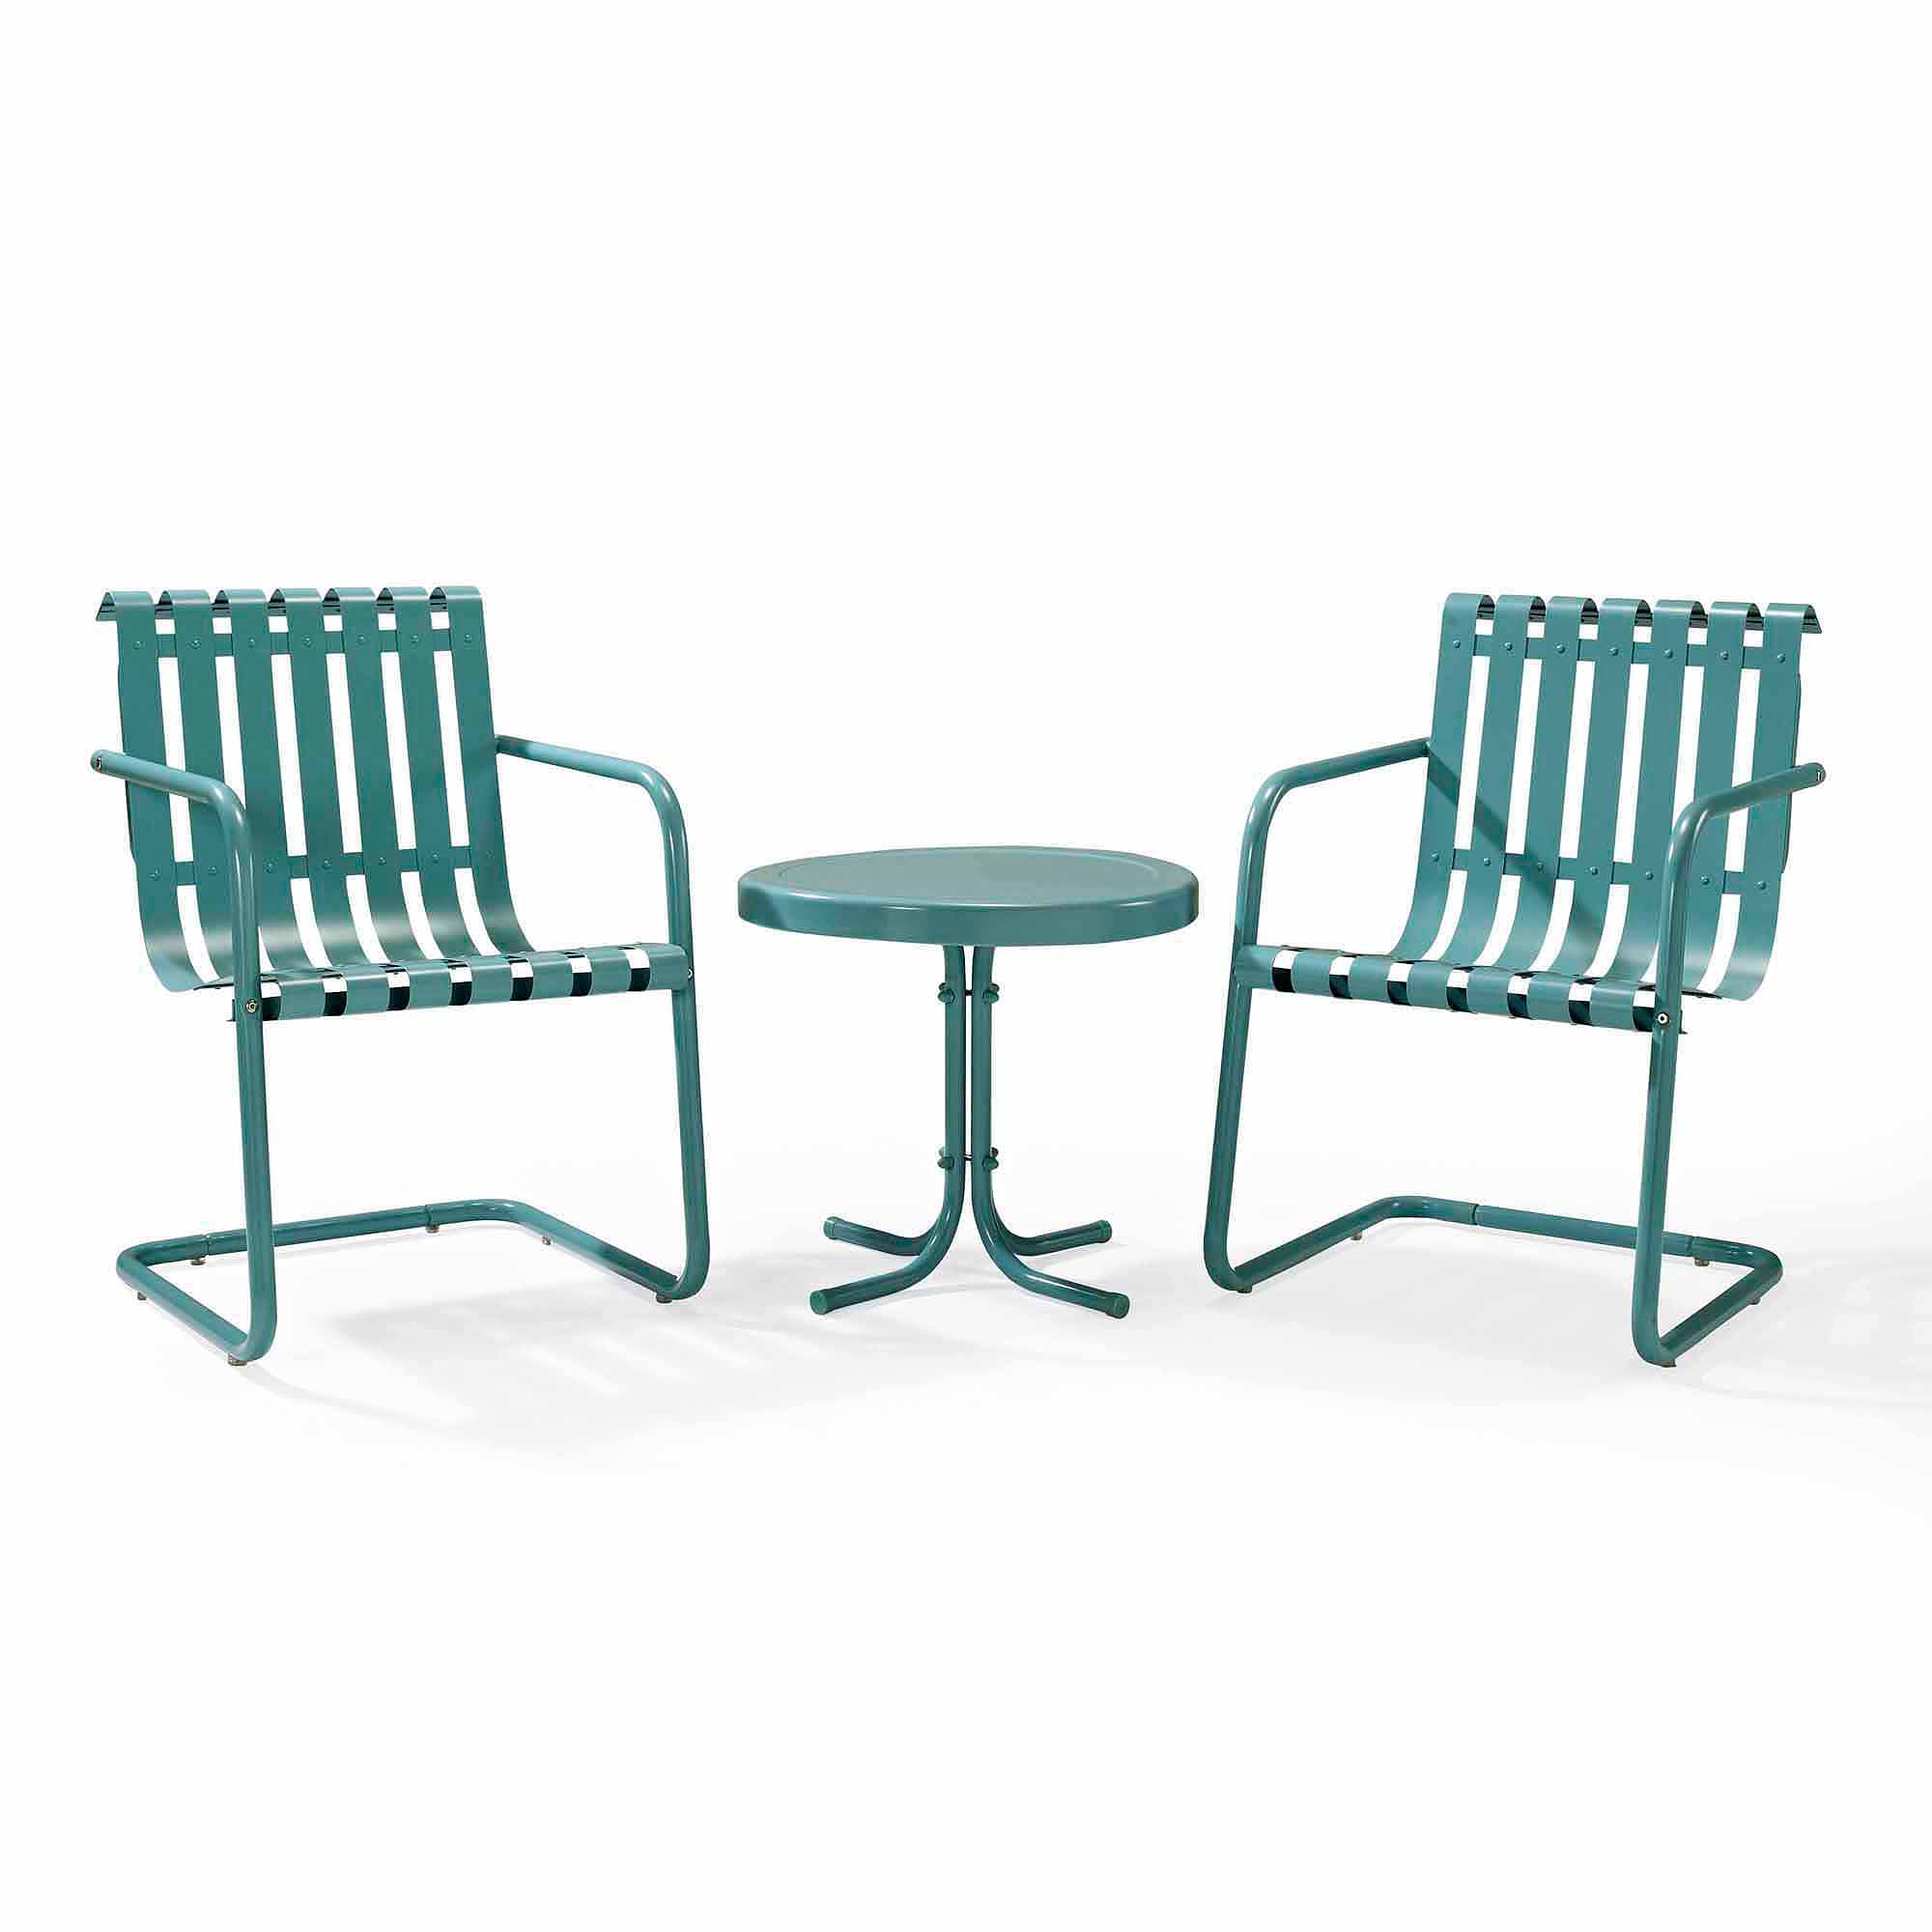 Crosley Furniture Gracie 3 Piece Metal Outdoor Conversation